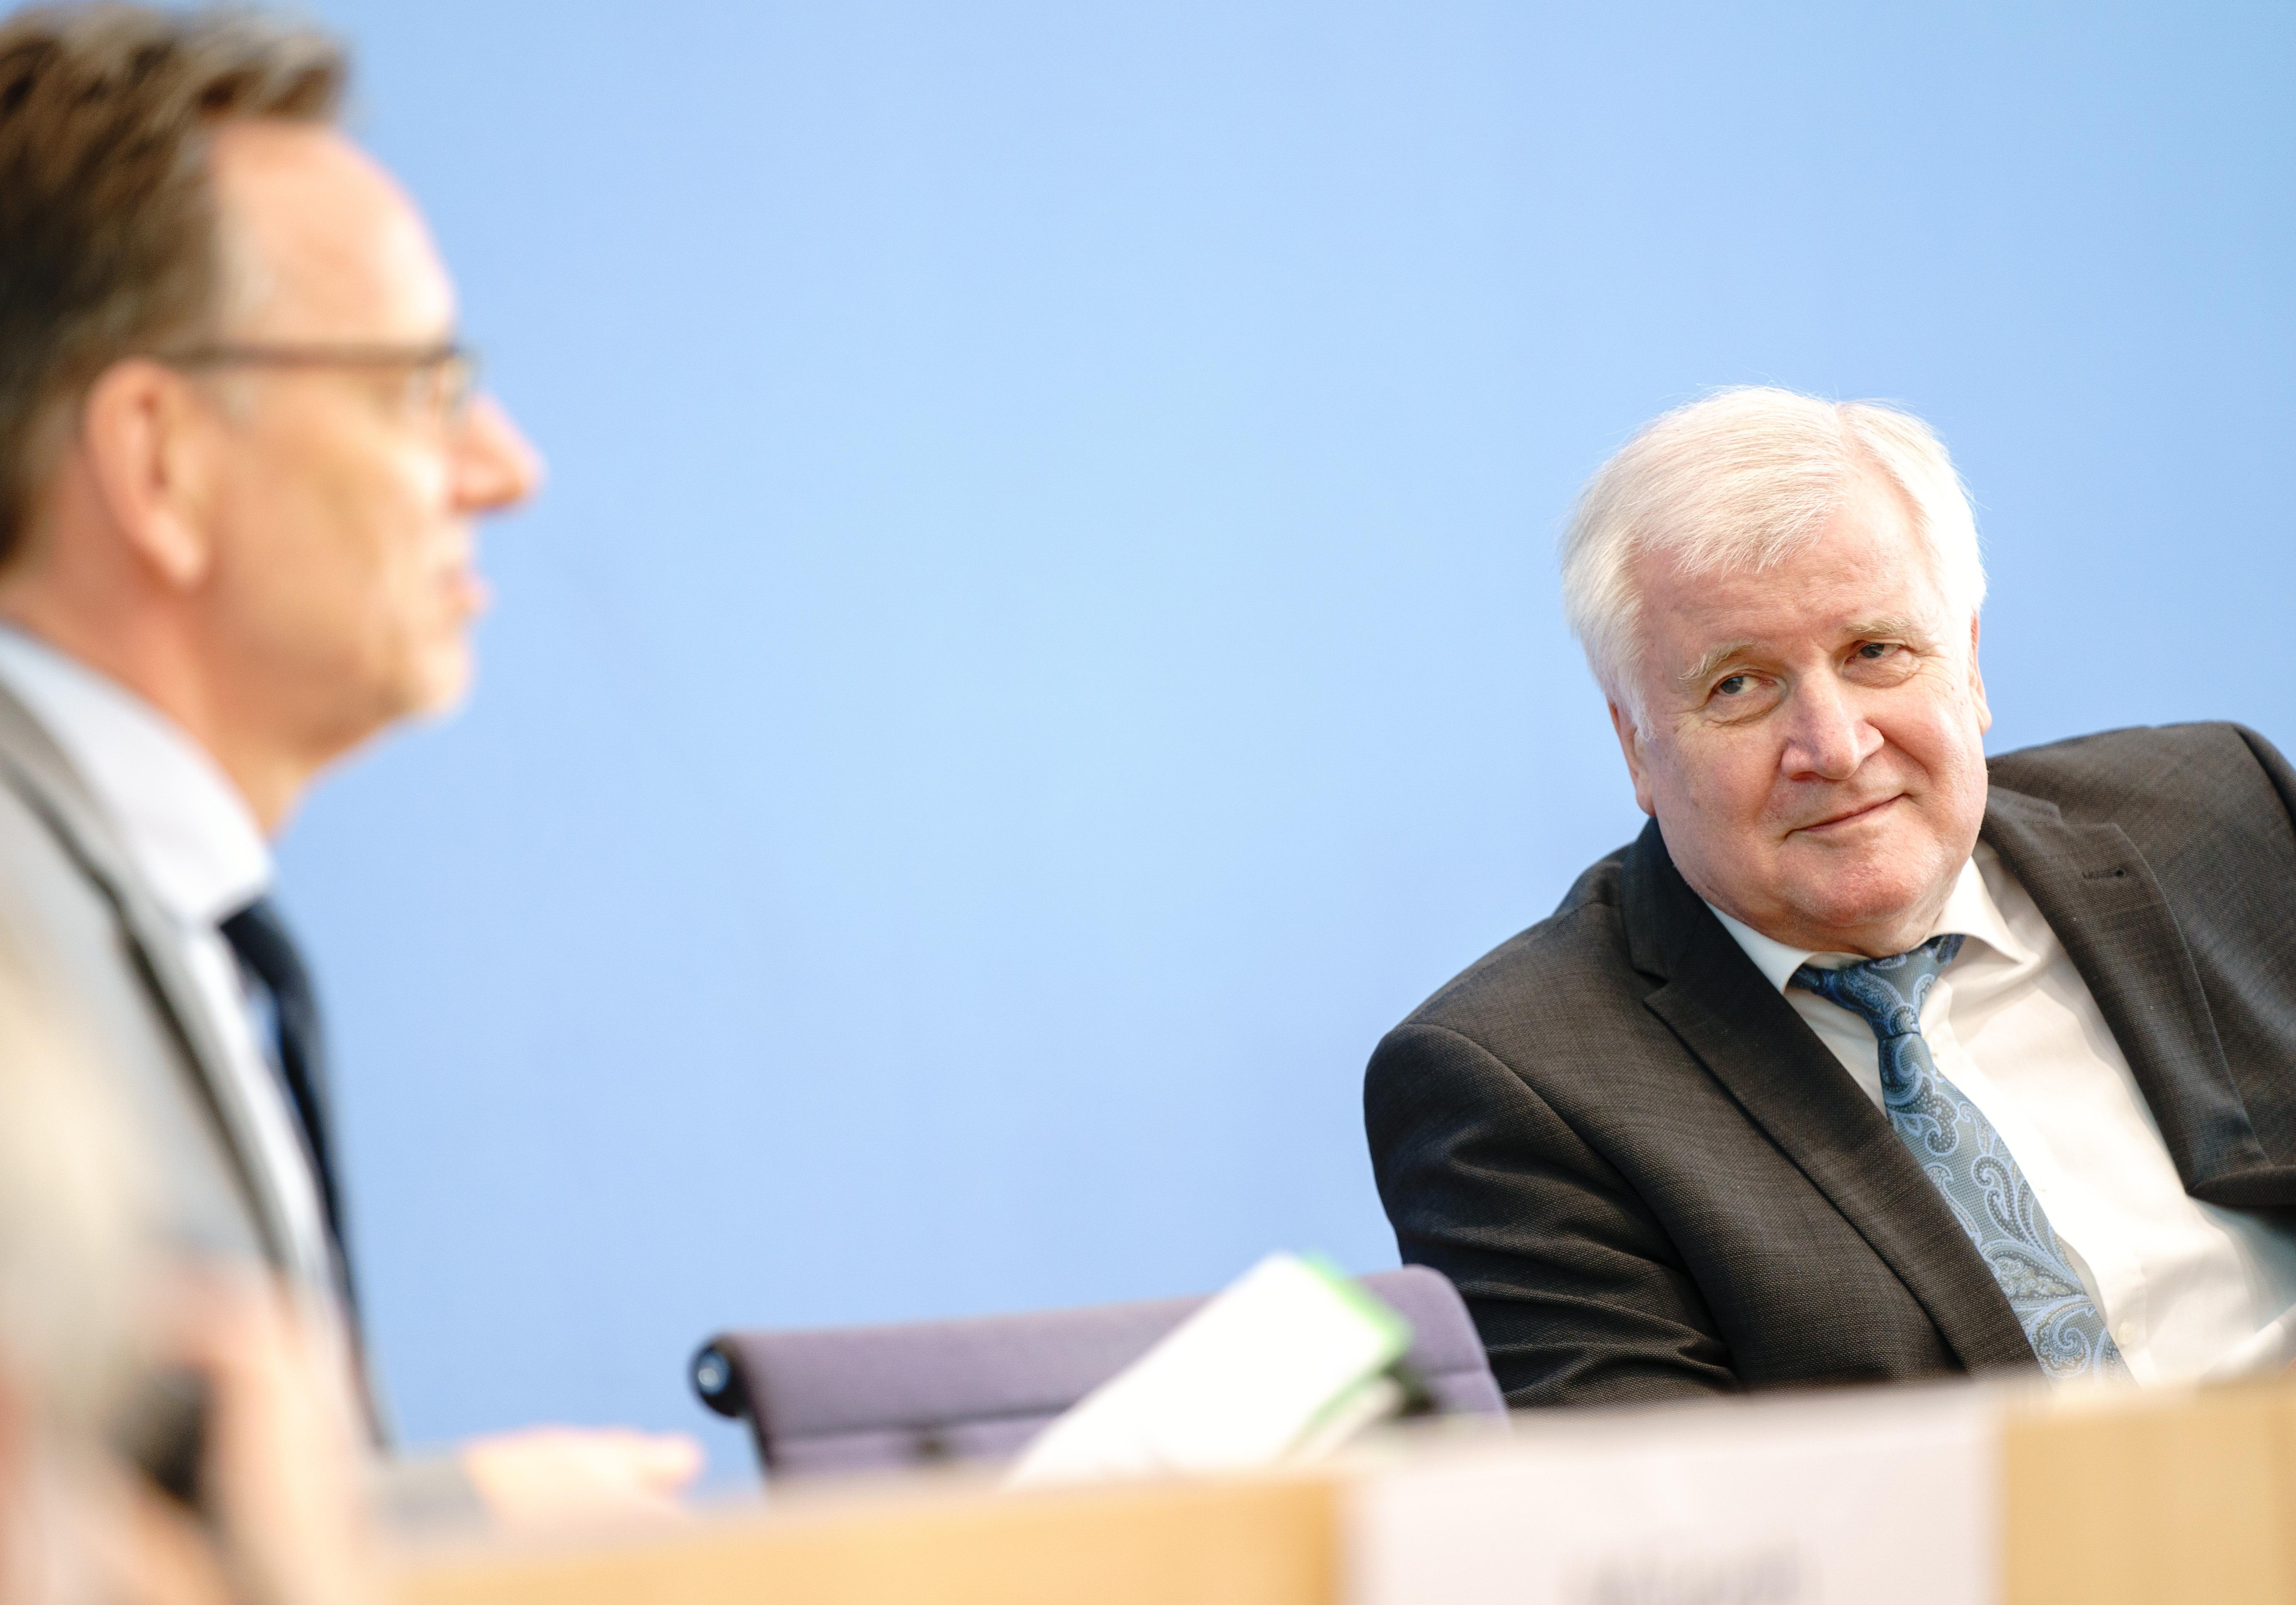 Bundesinnenminister in Quarantäne: Horst Seehofer mit Corona infiziert